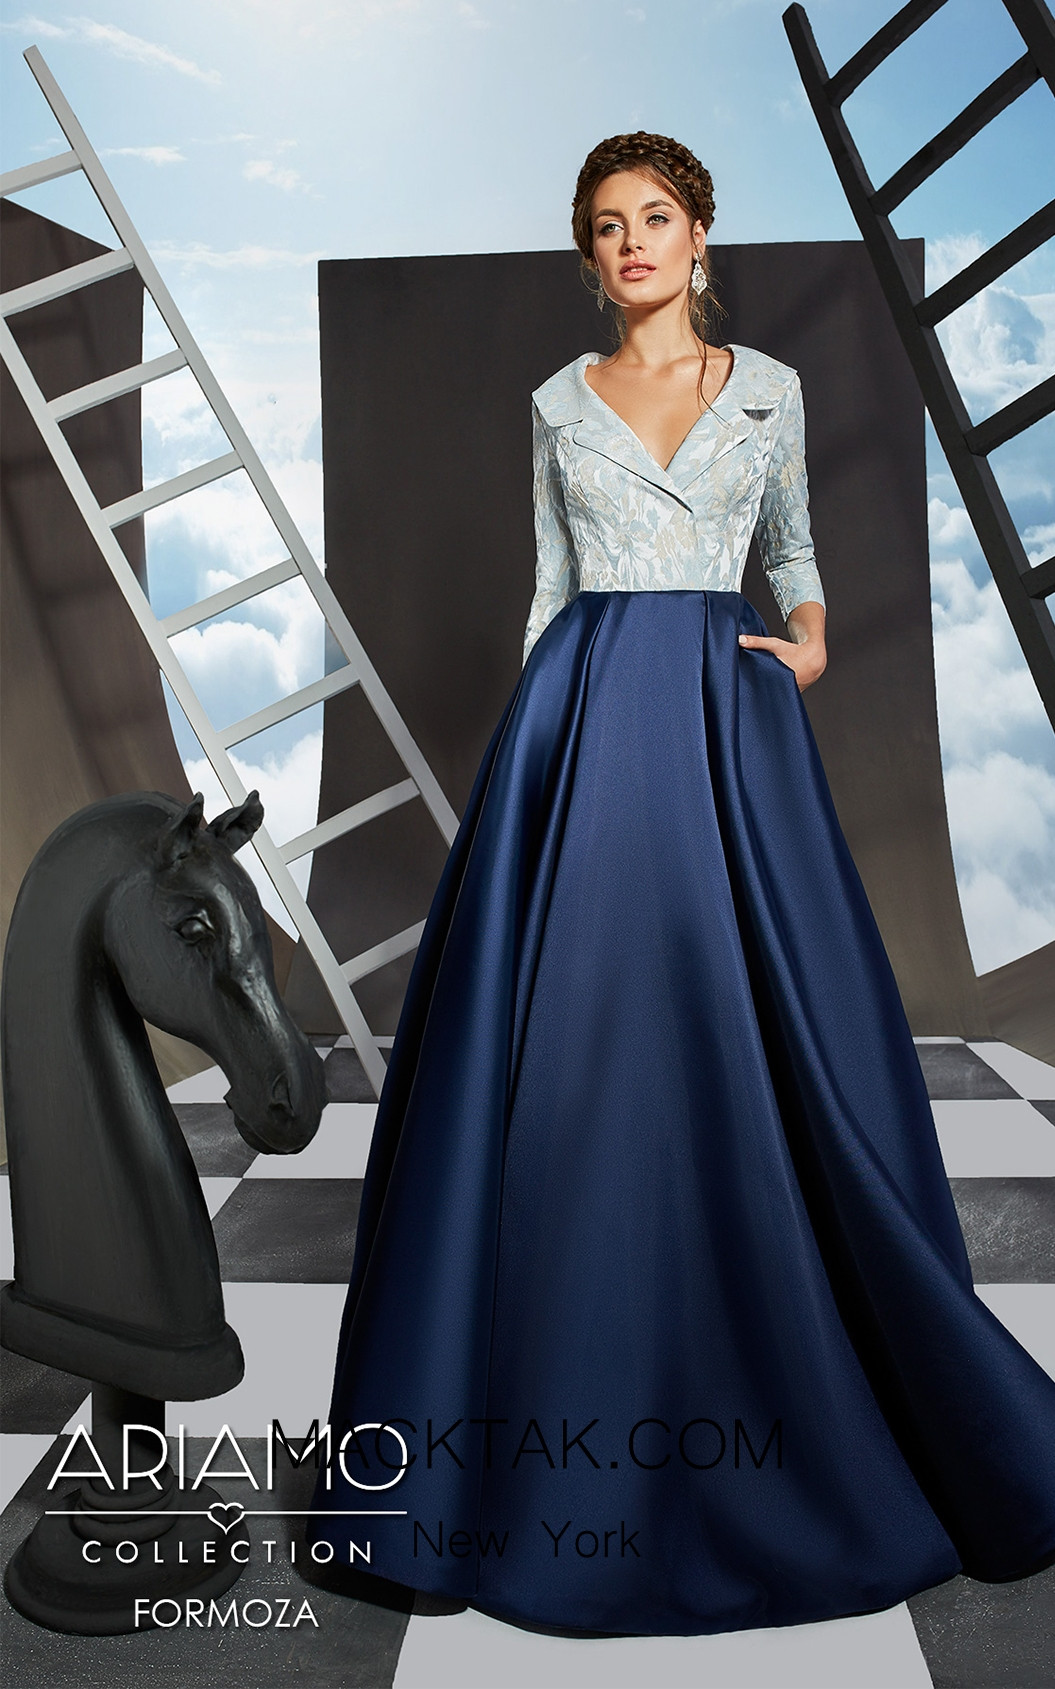 Ariamo Formoza Front Dress